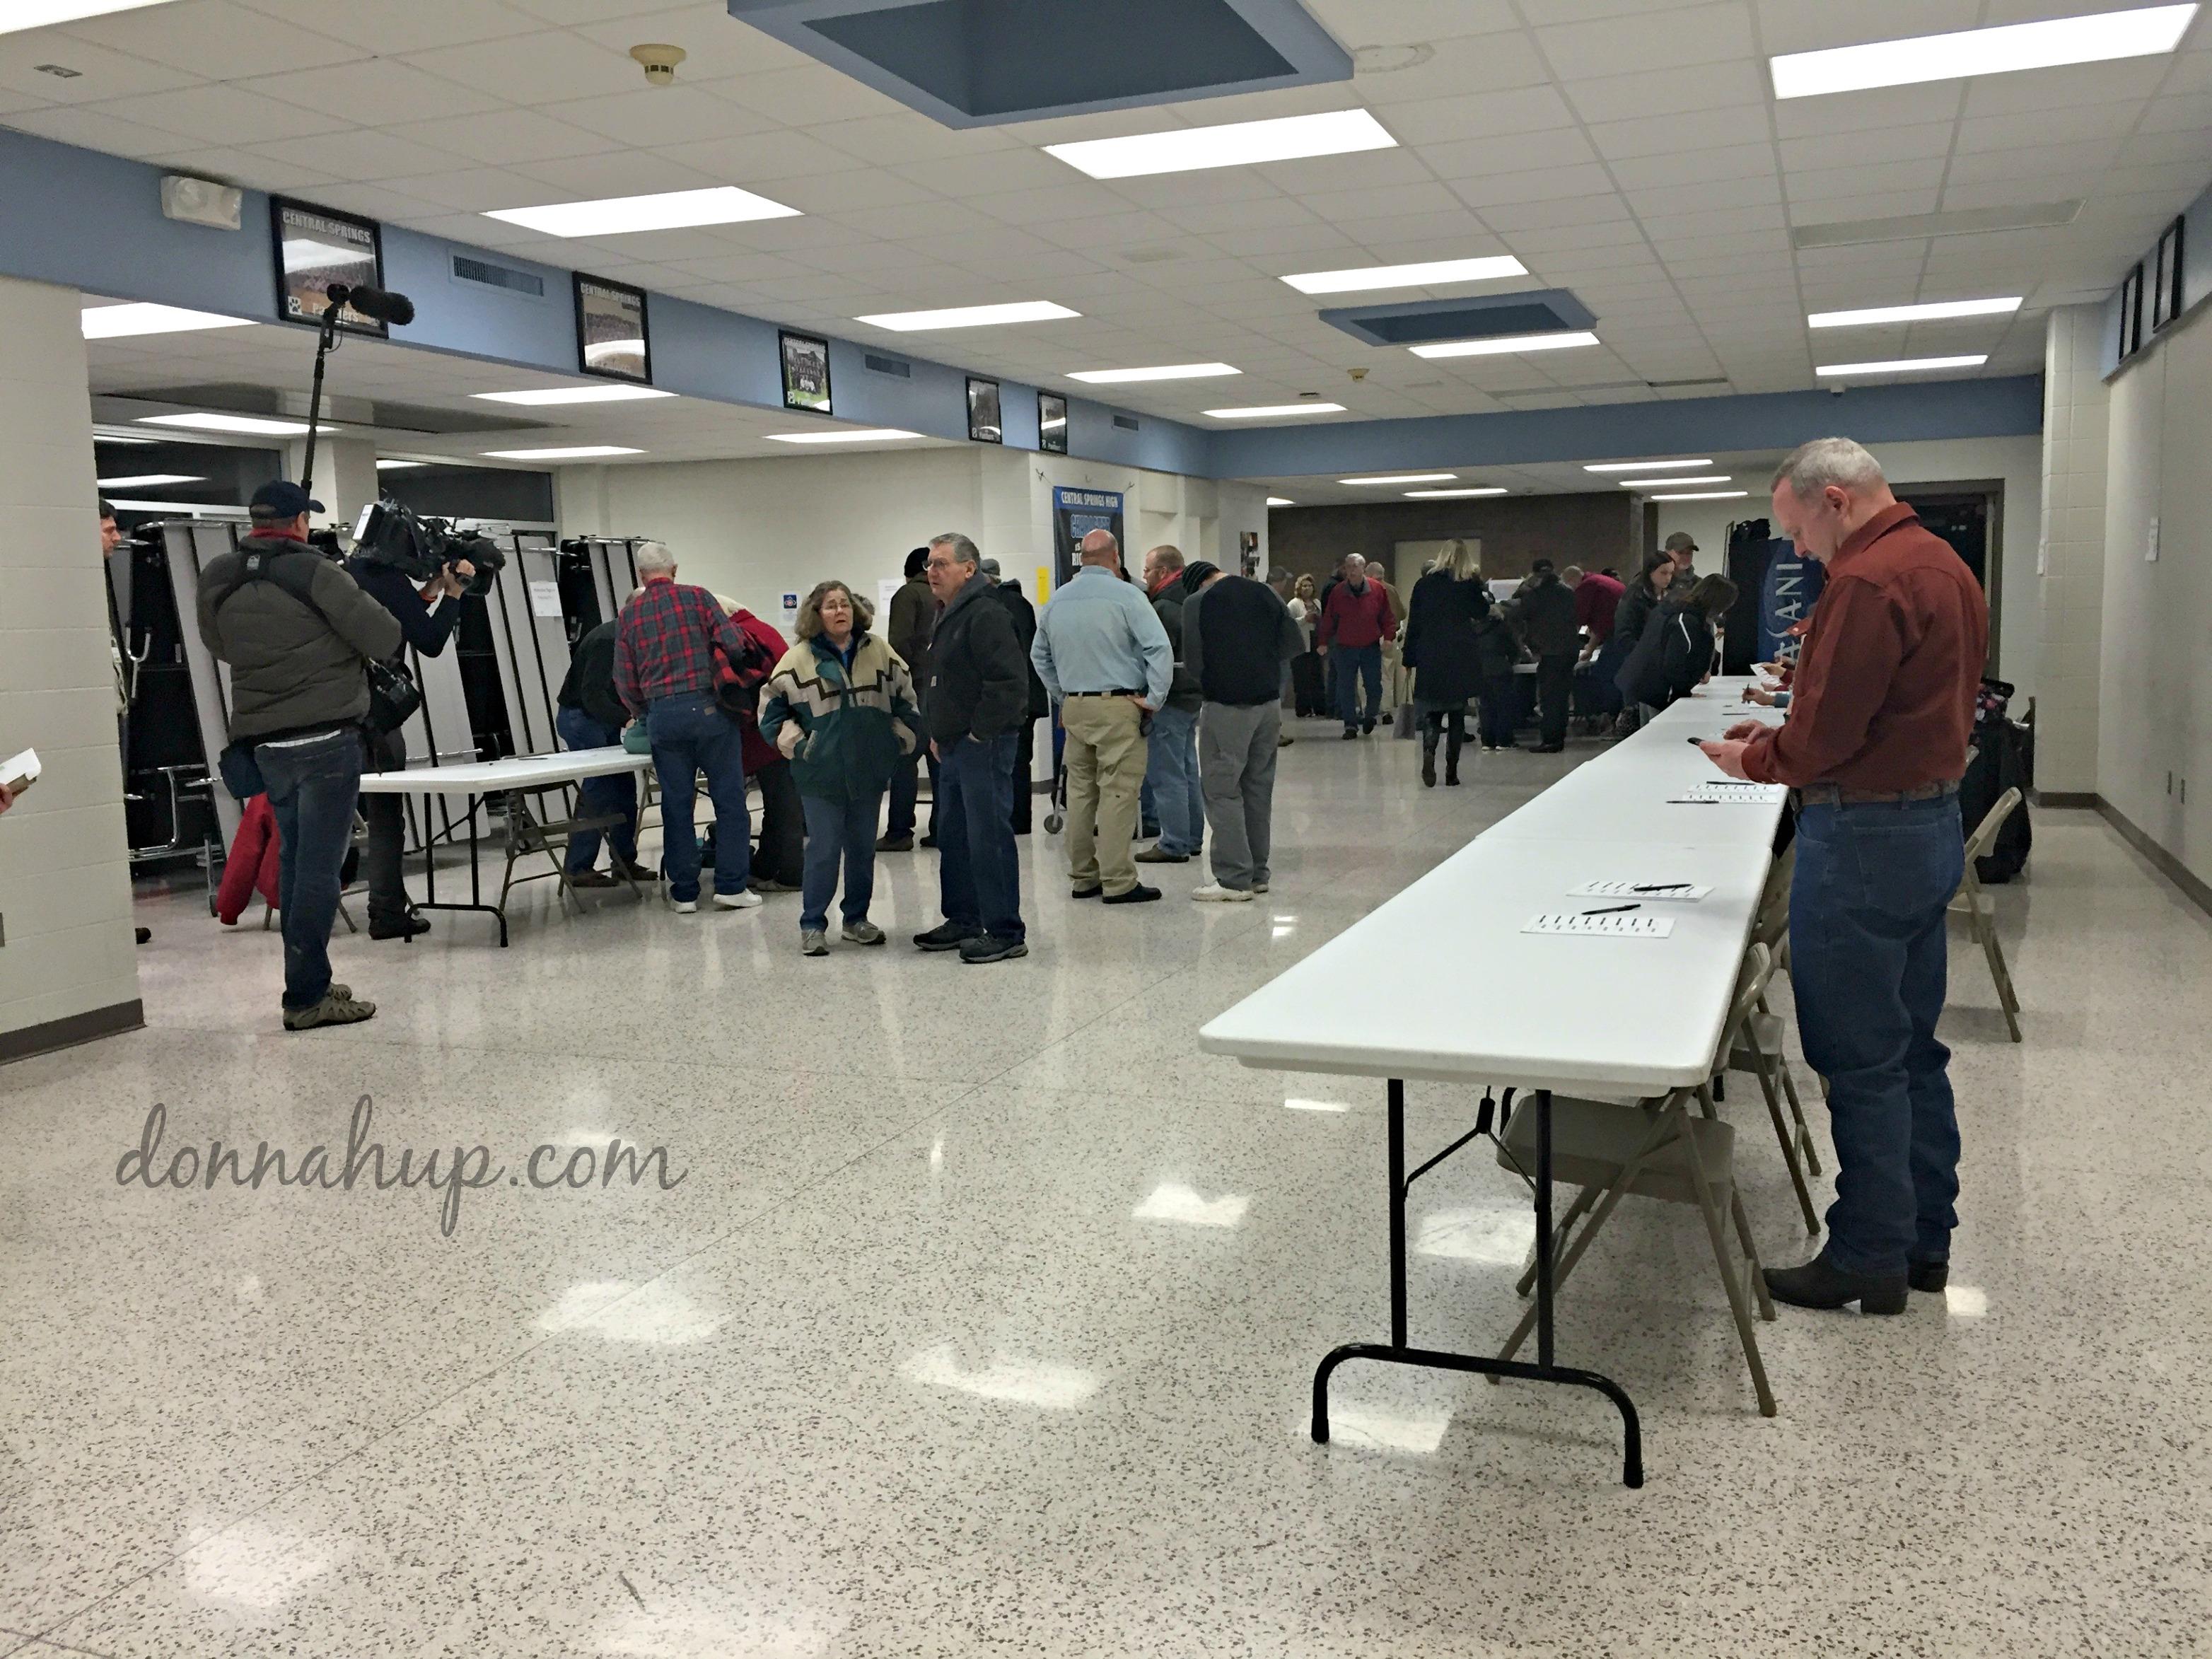 Checking in at my first Iowa Caucus My First Iowa Caucus